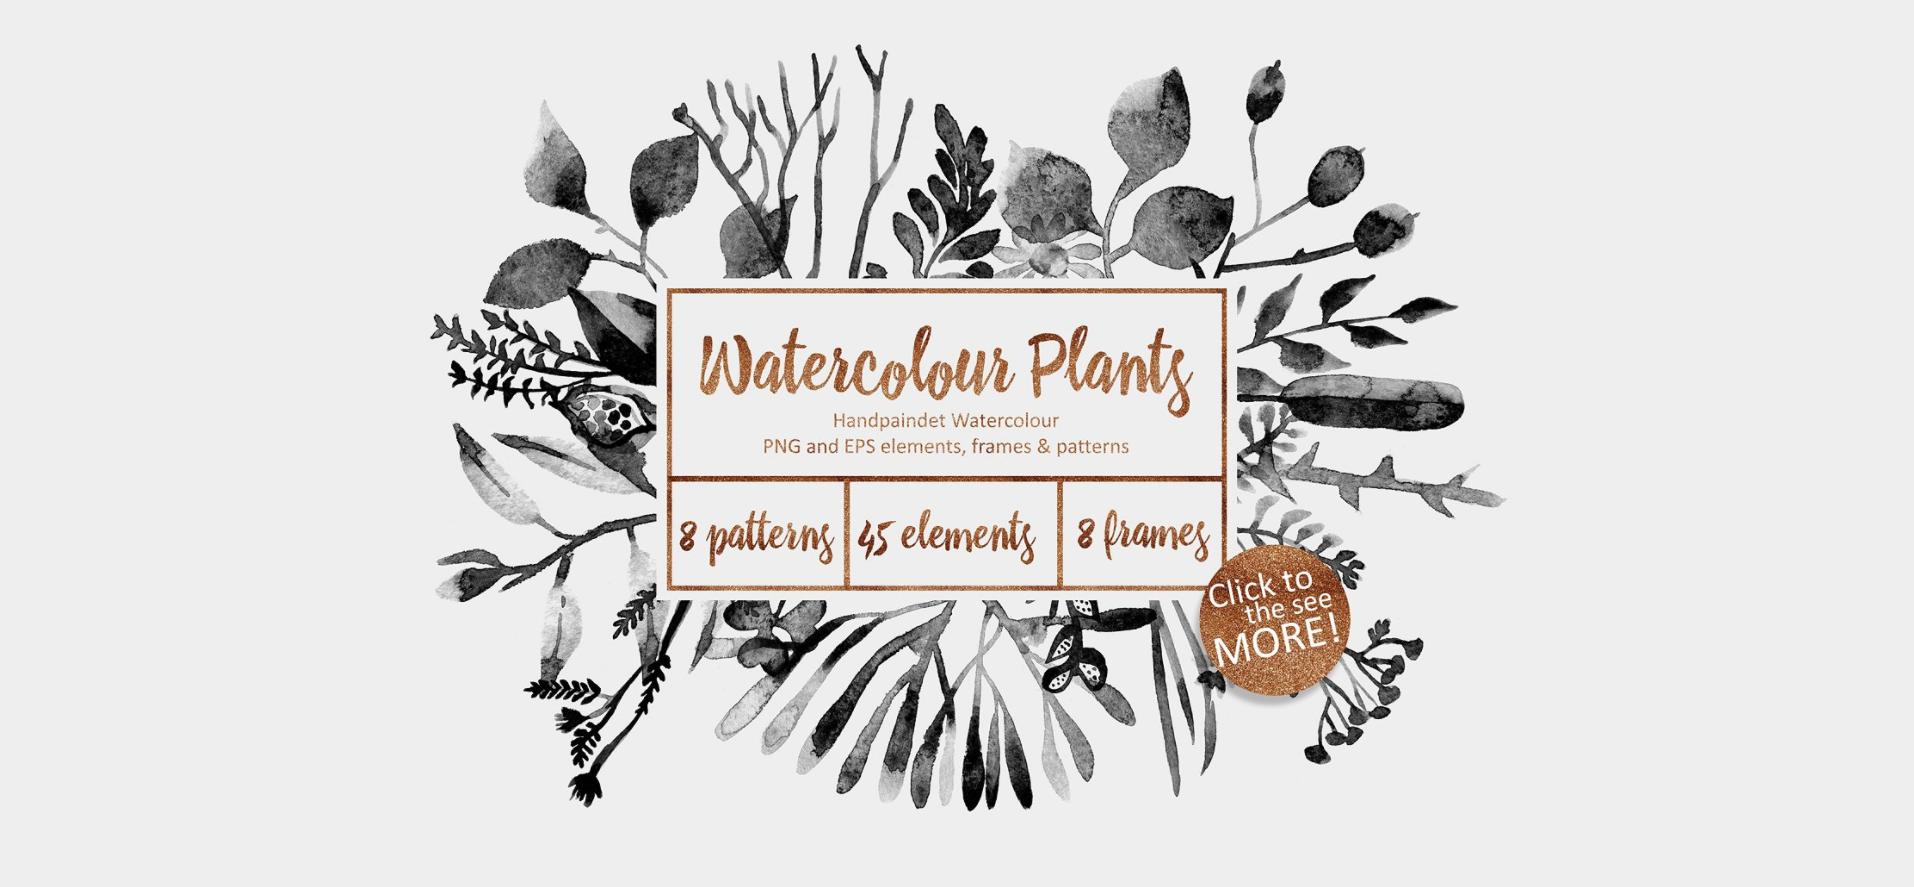 Watercolor Plants by Creative Market